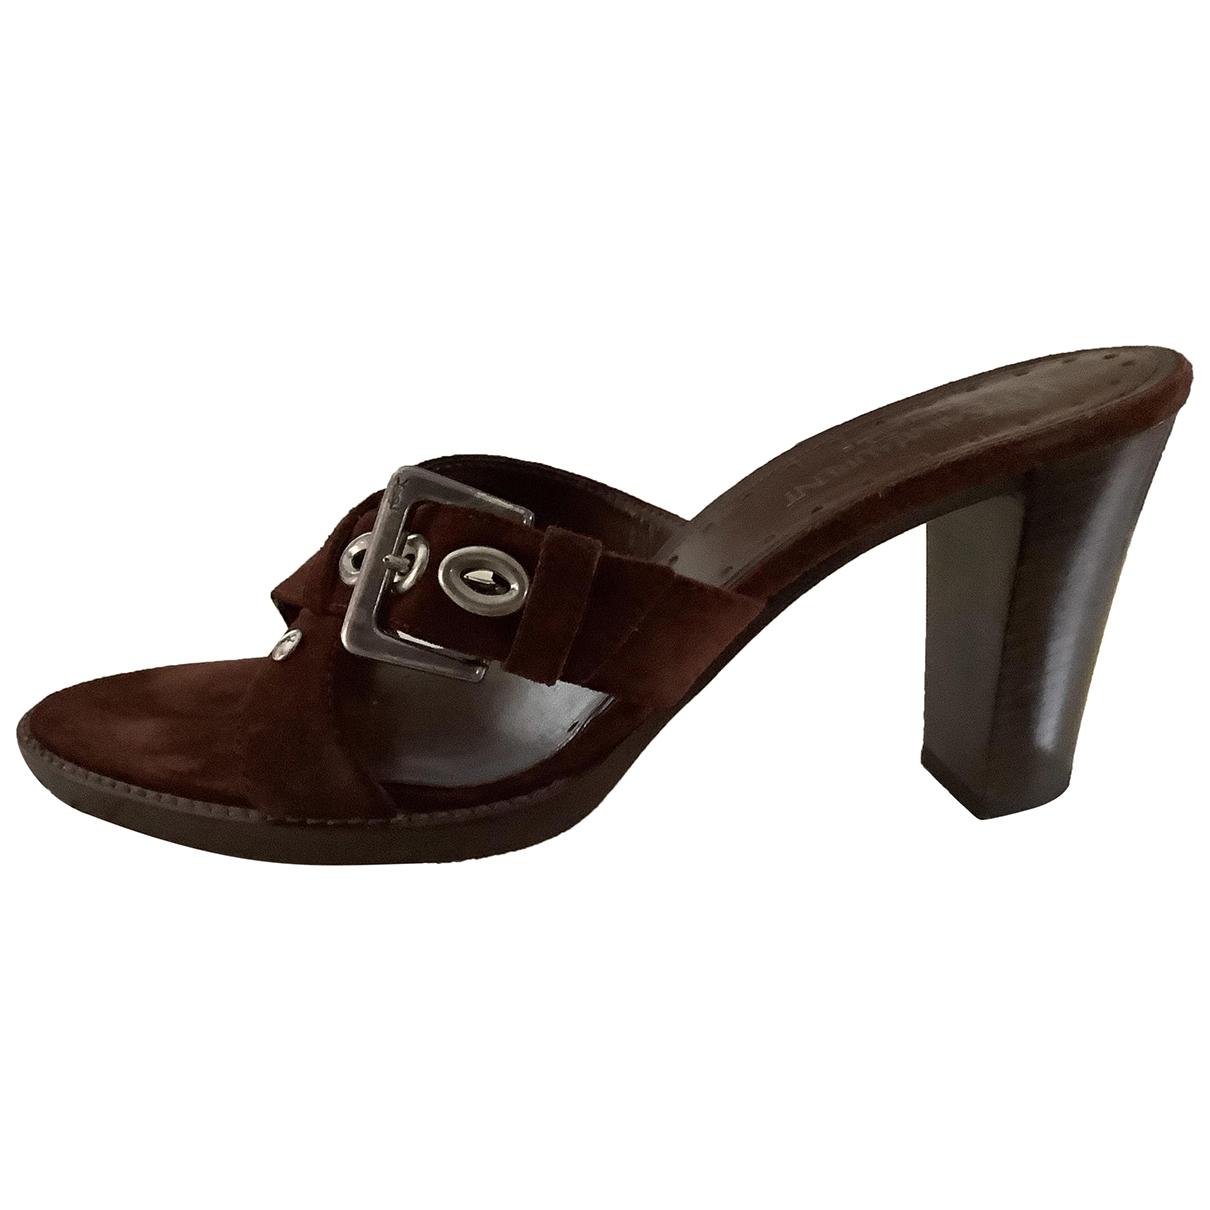 Yves Saint Laurent \N Brown Suede Sandals for Women 40 IT